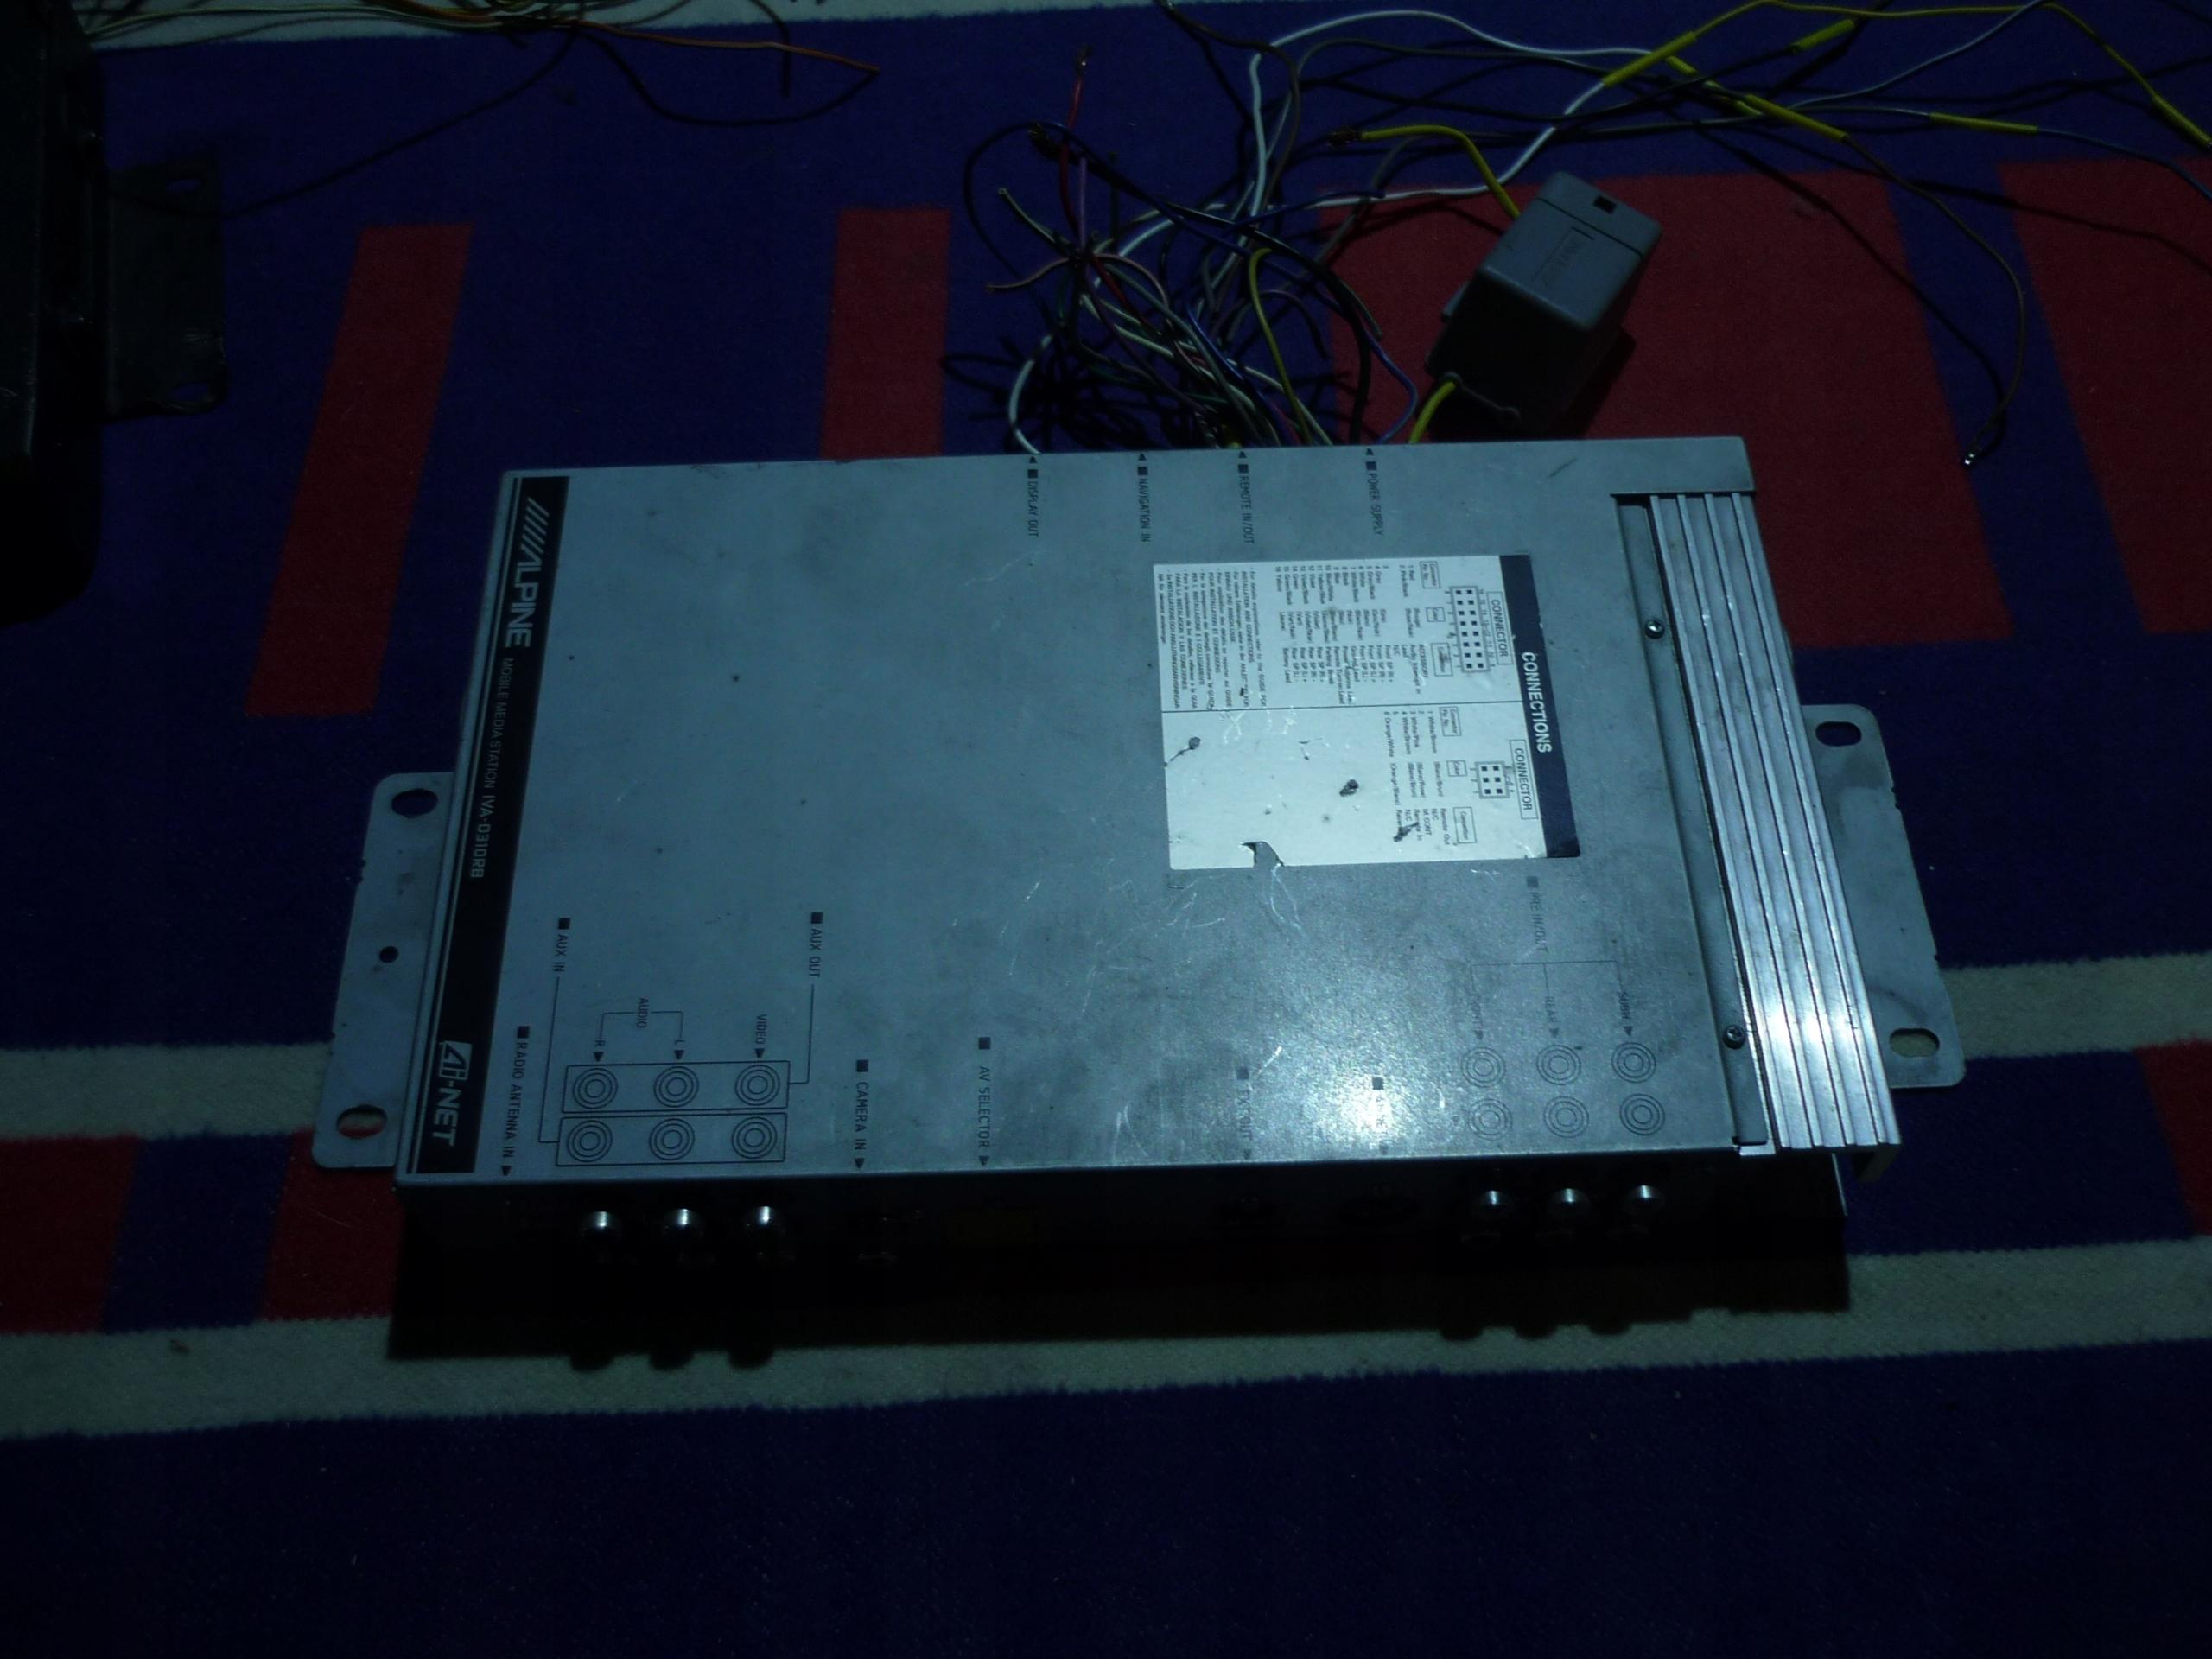 Alpine IVA-D310RB